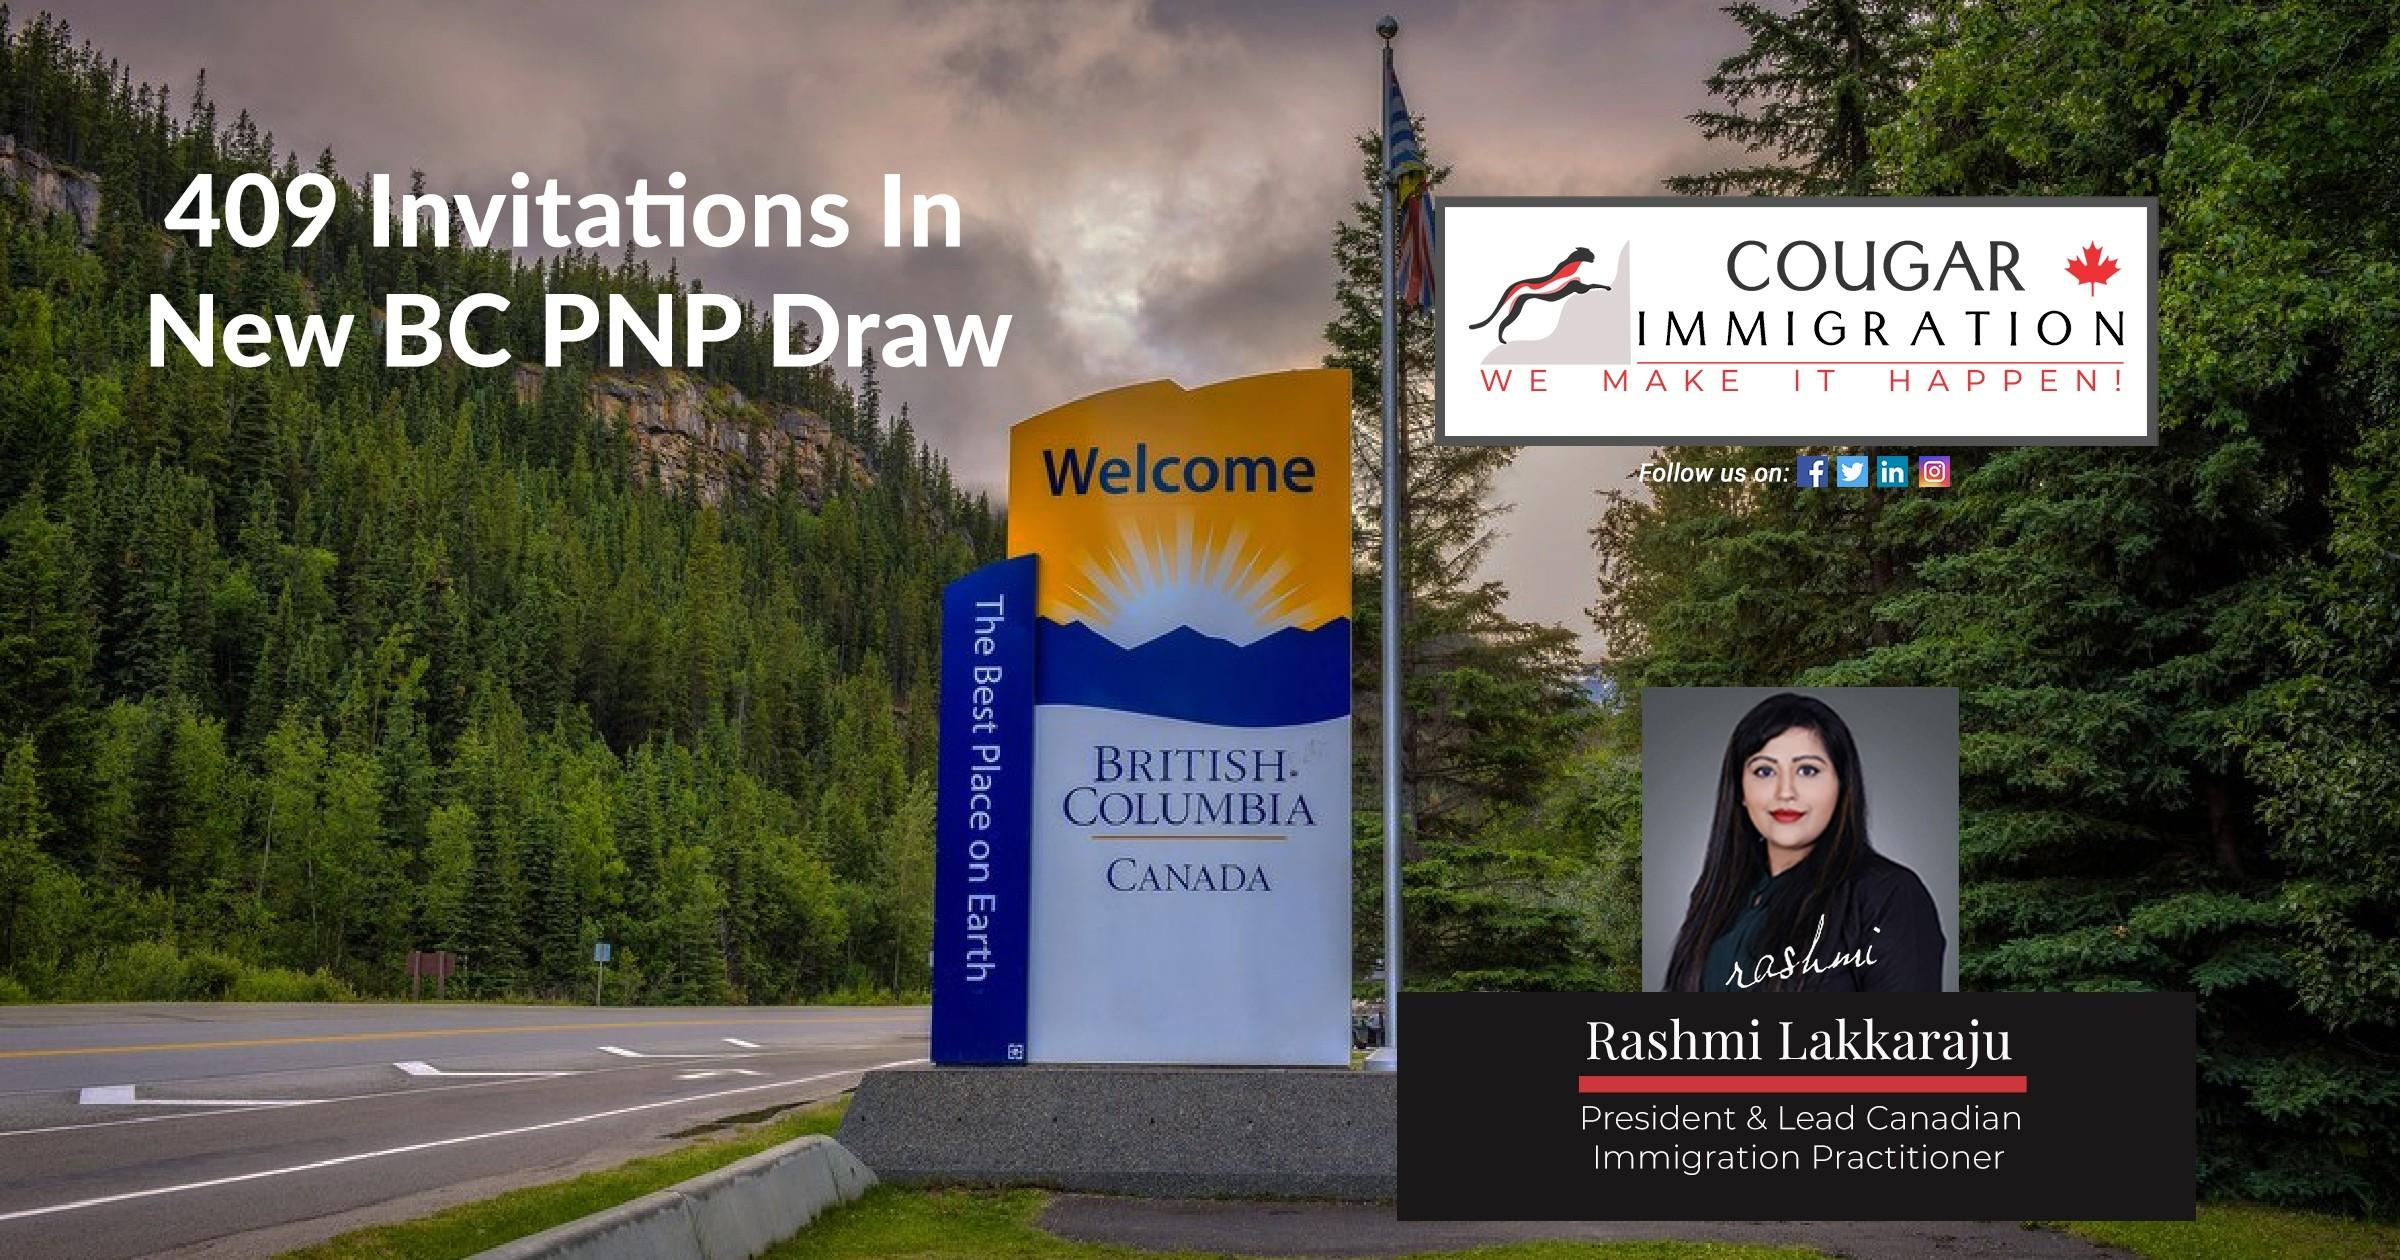 British Columbia Issues 409 Invitations In New BC PNP Draw thumbnail